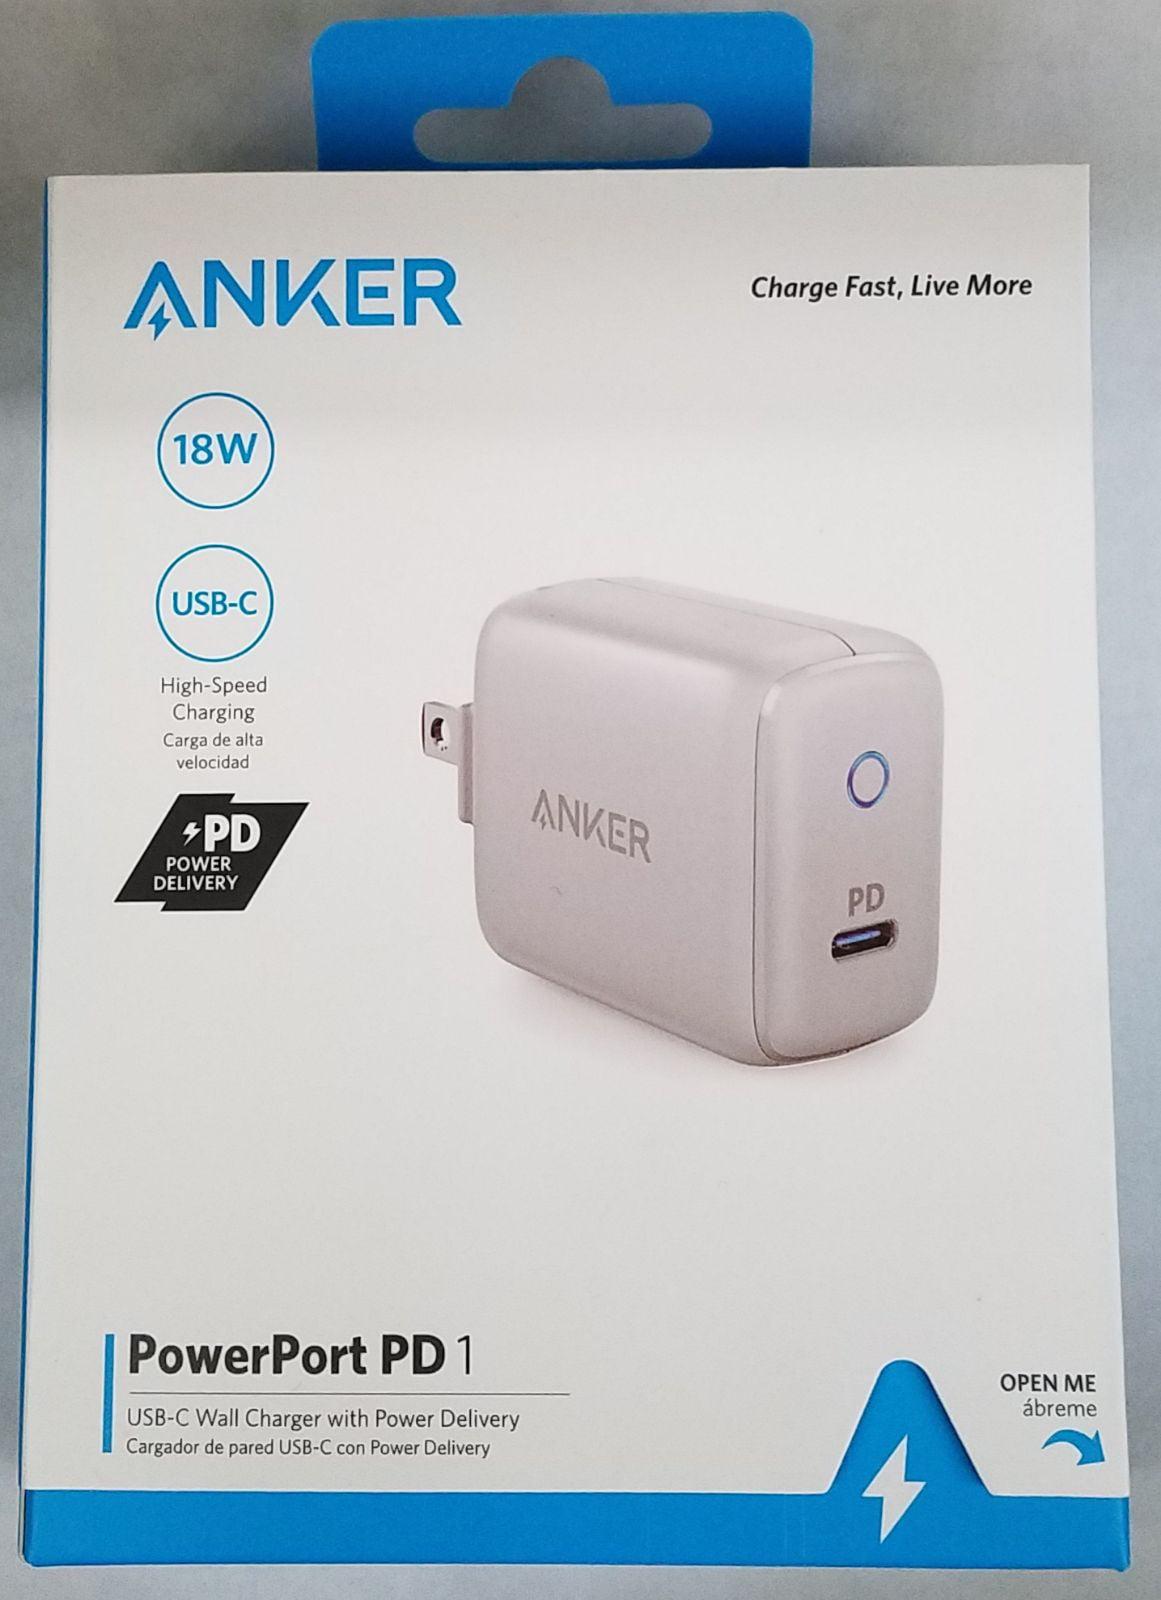 Anker Powerport Pd 1 Port (18w) Wall Cha